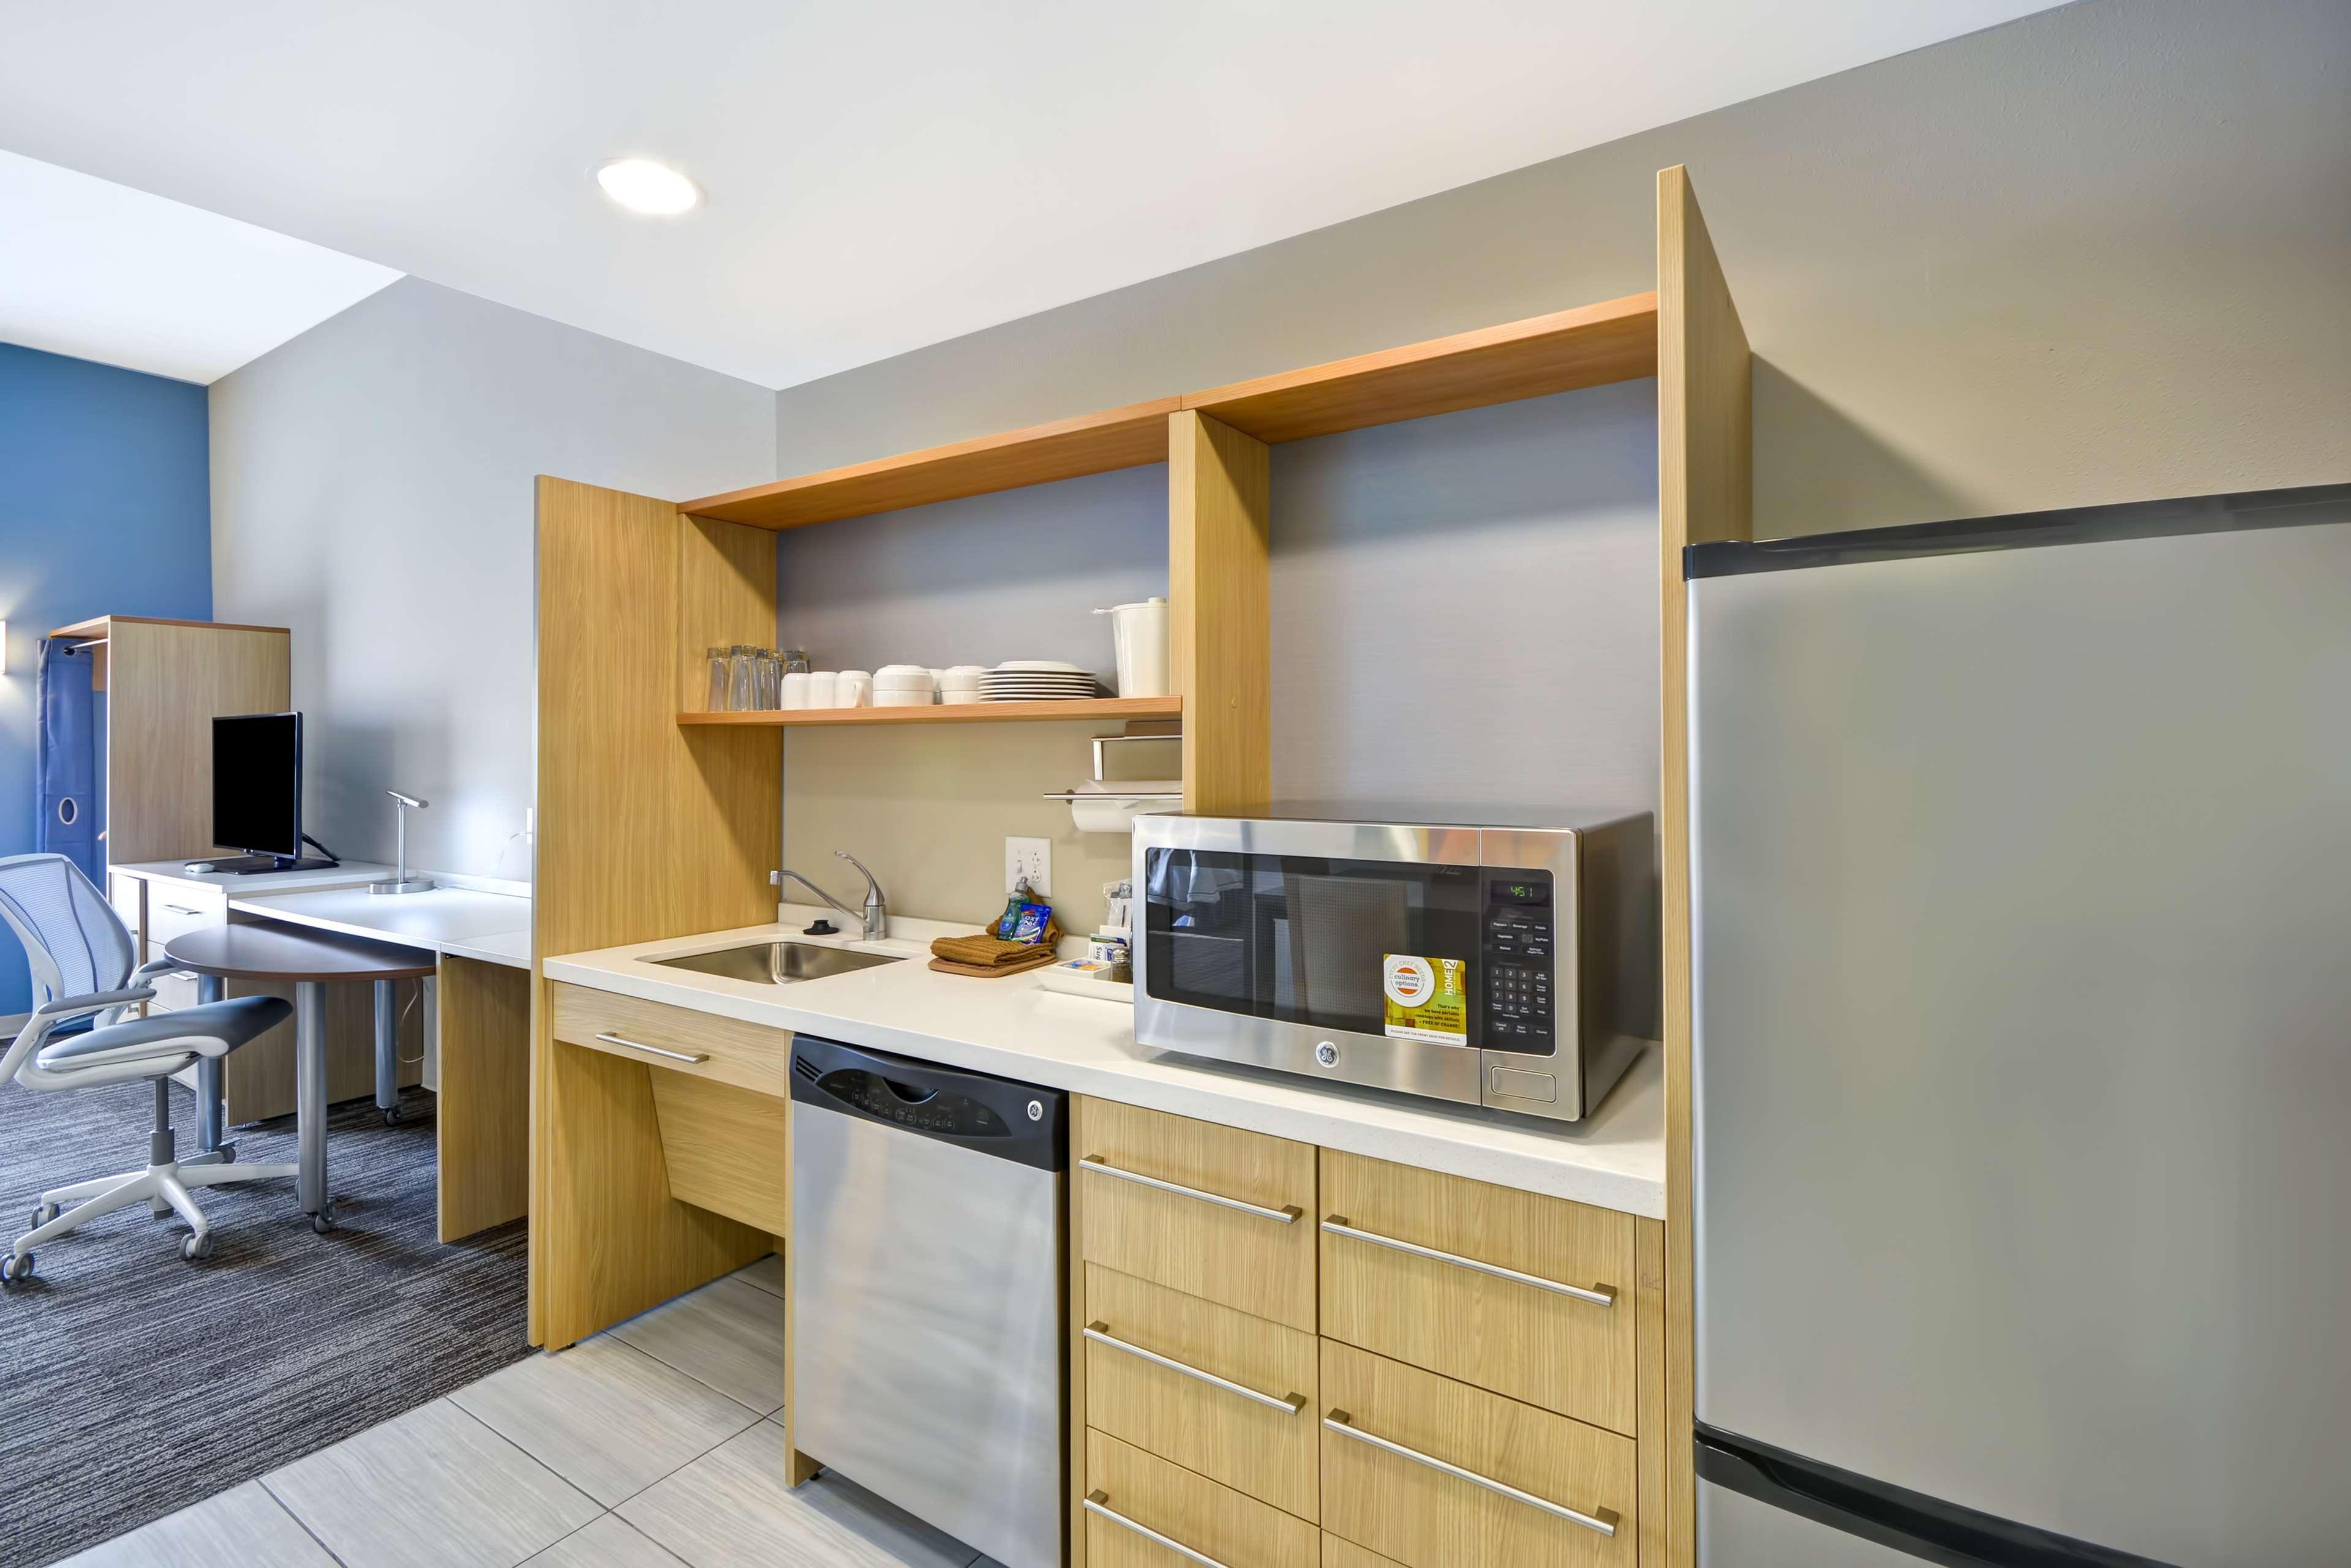 Home2 Suites by Hilton  St. Simons Island image 39